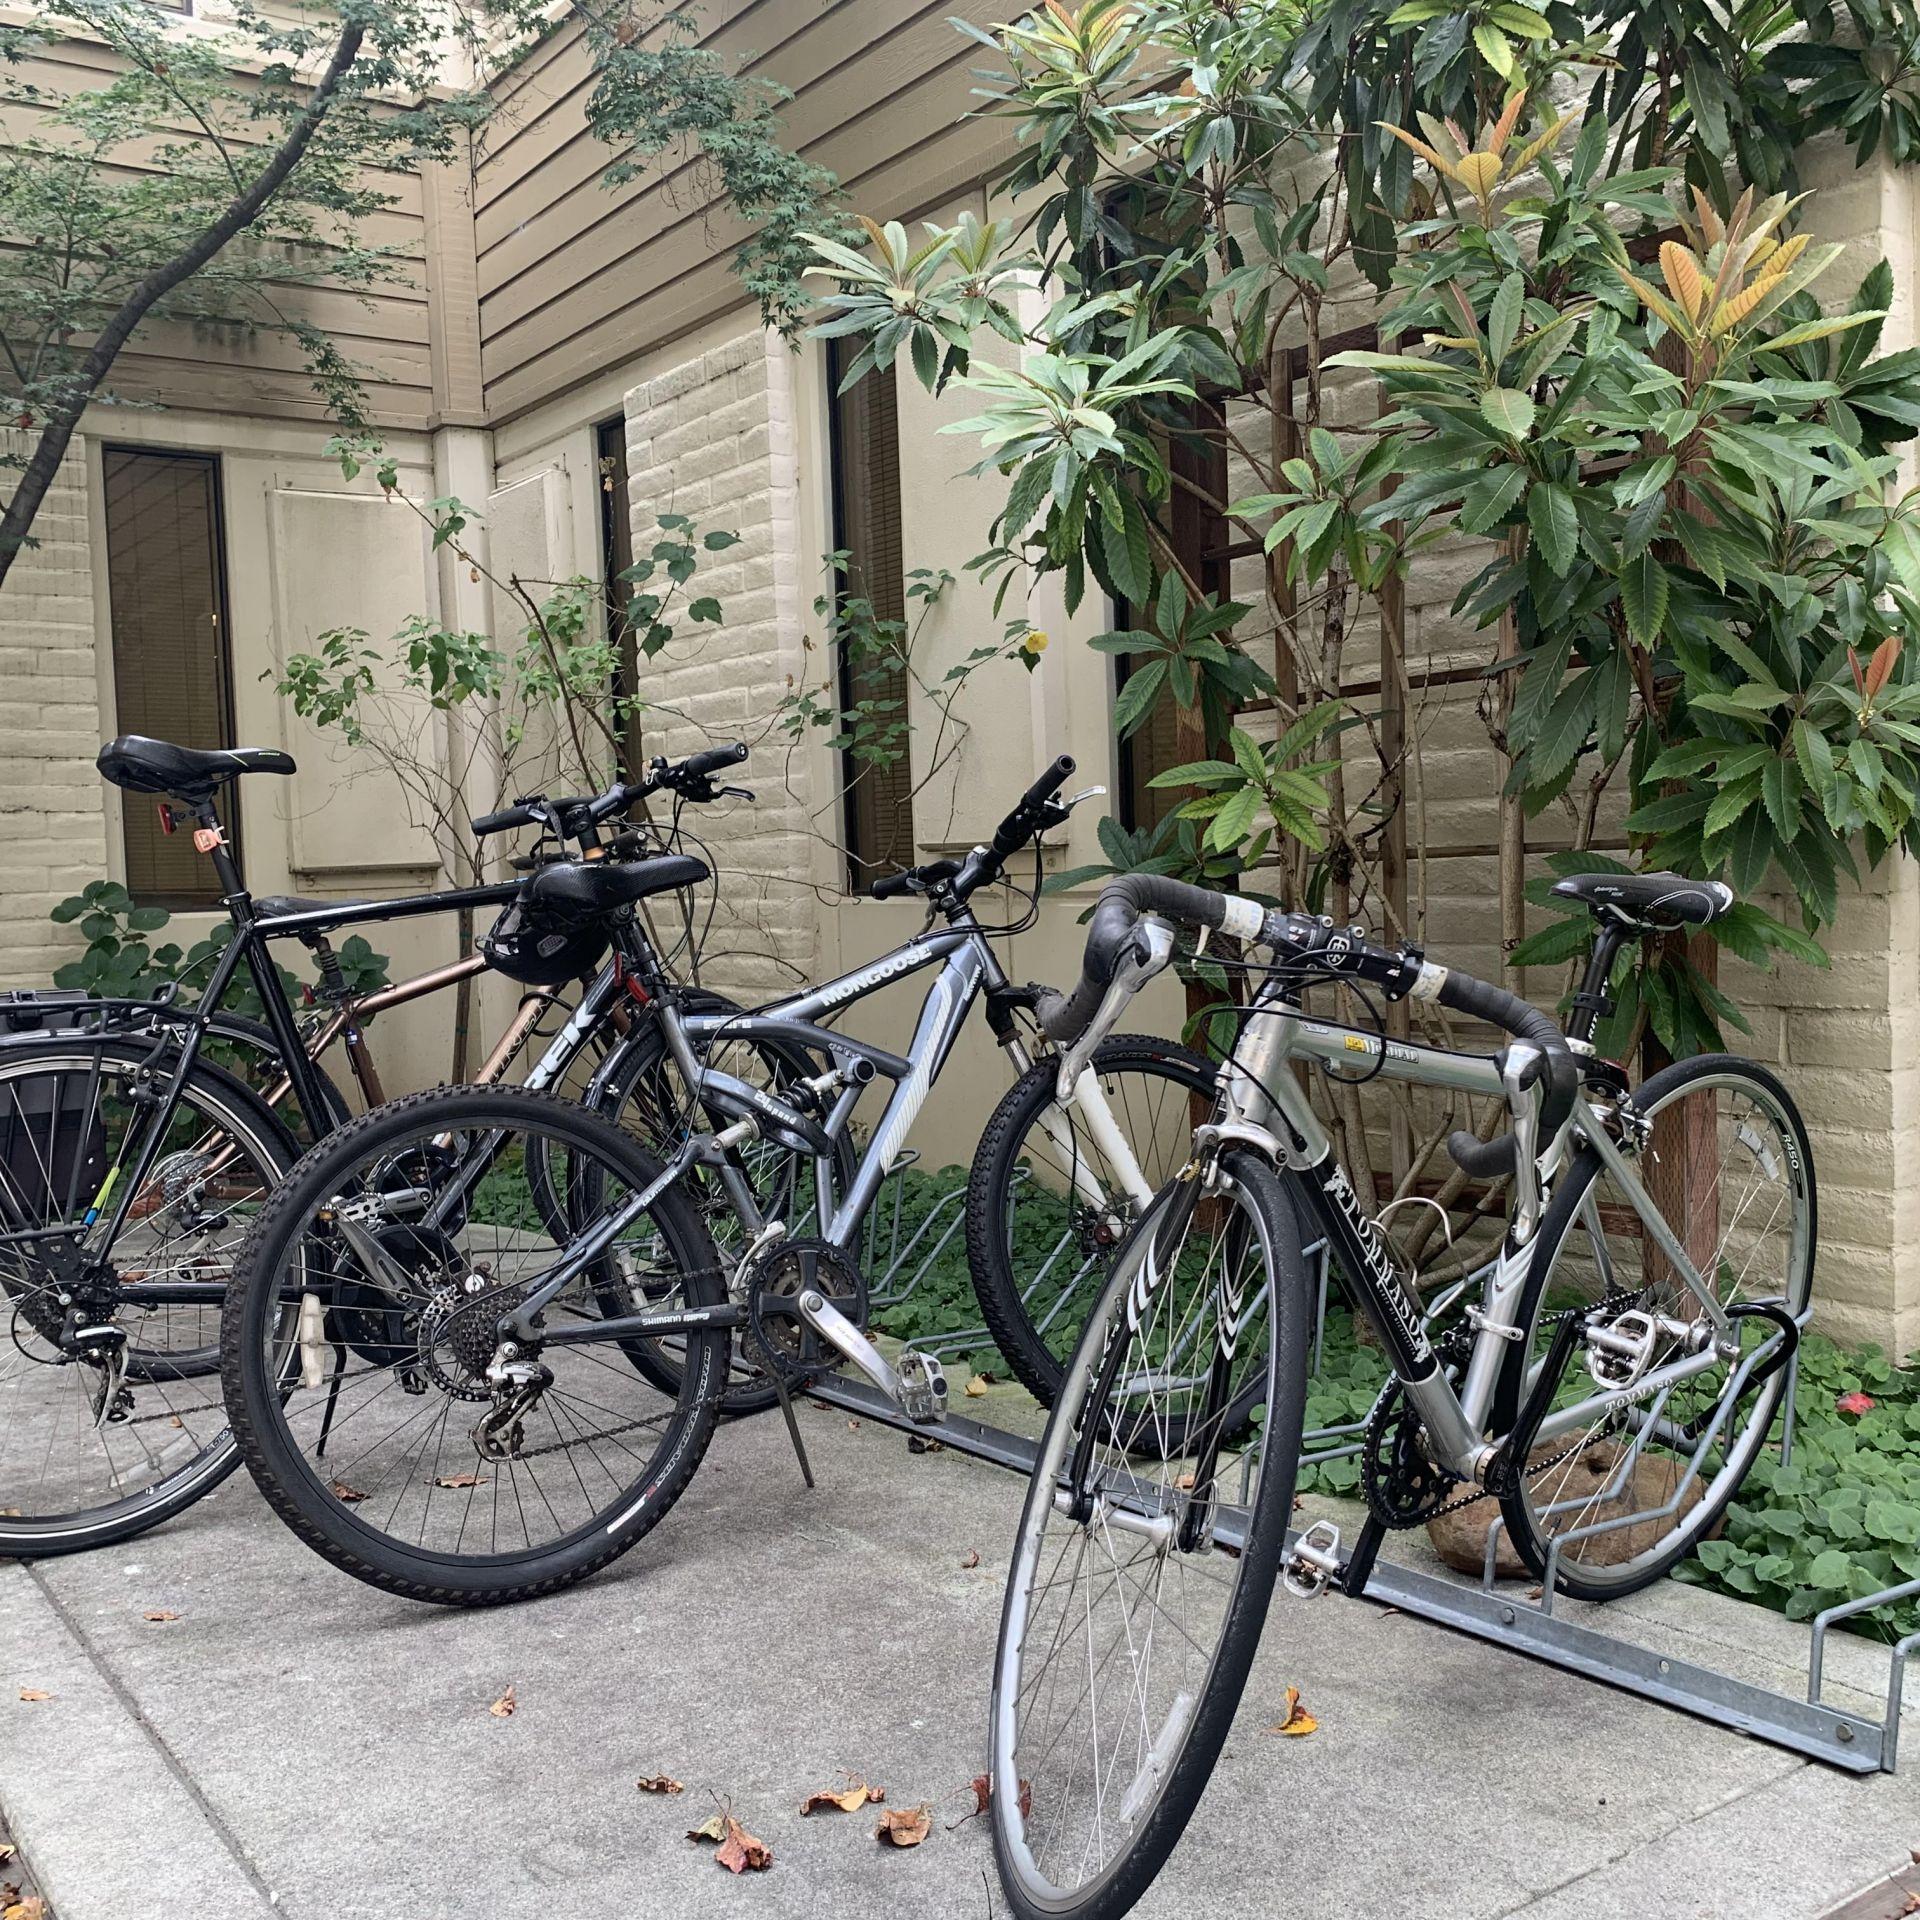 enerspace - Palo Alto, Palo Alto